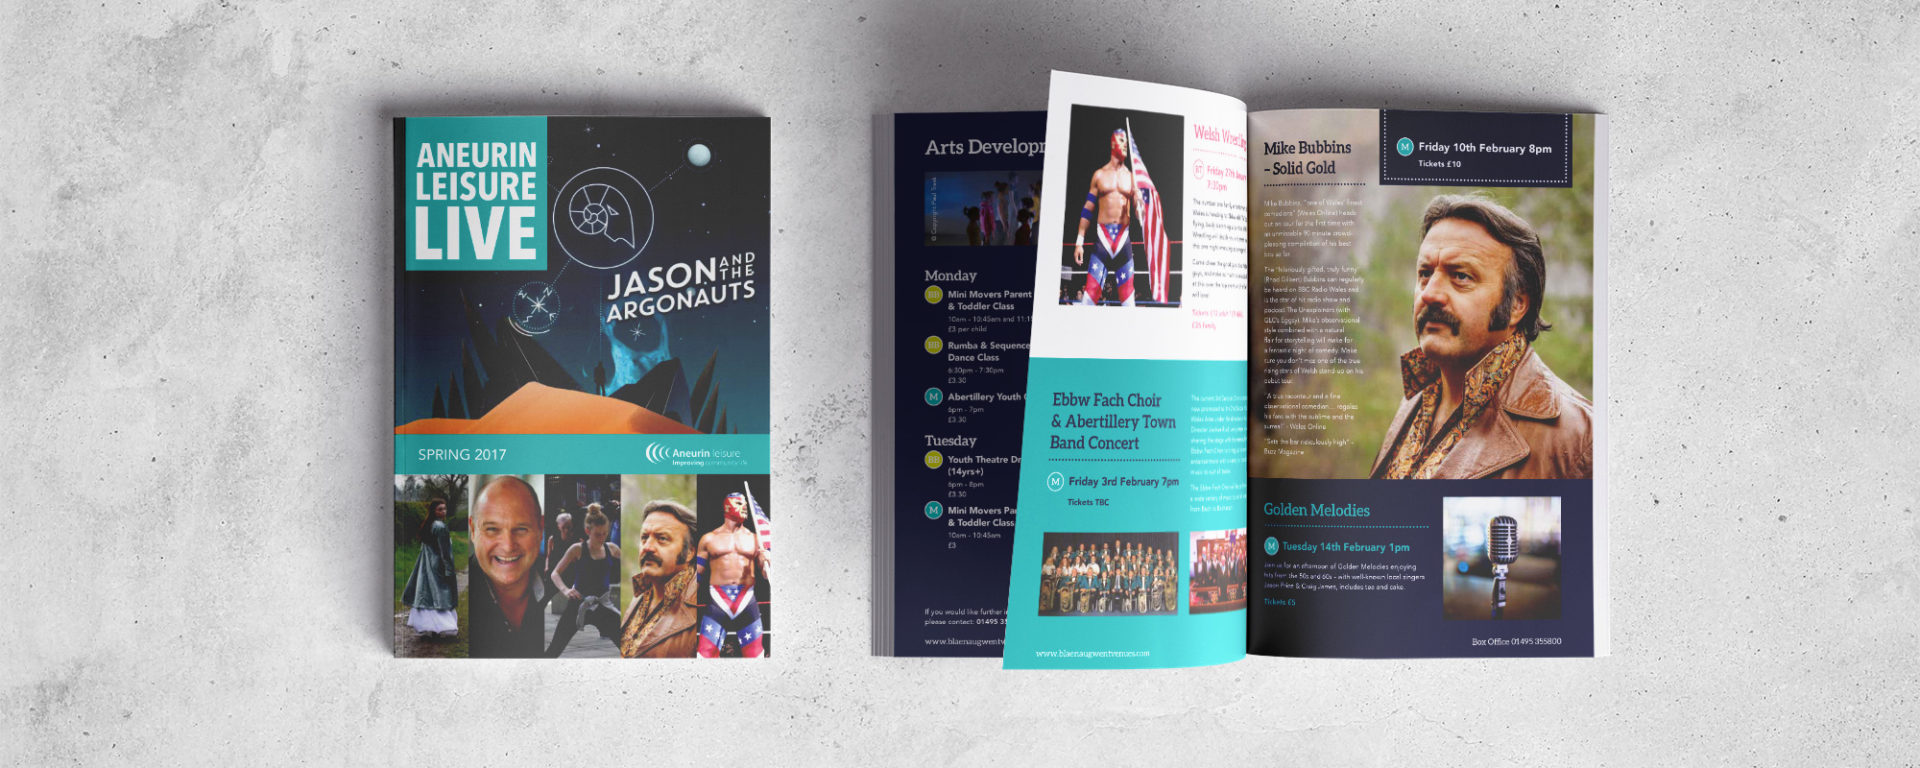 Aneurin Leisure Live Brochure Design